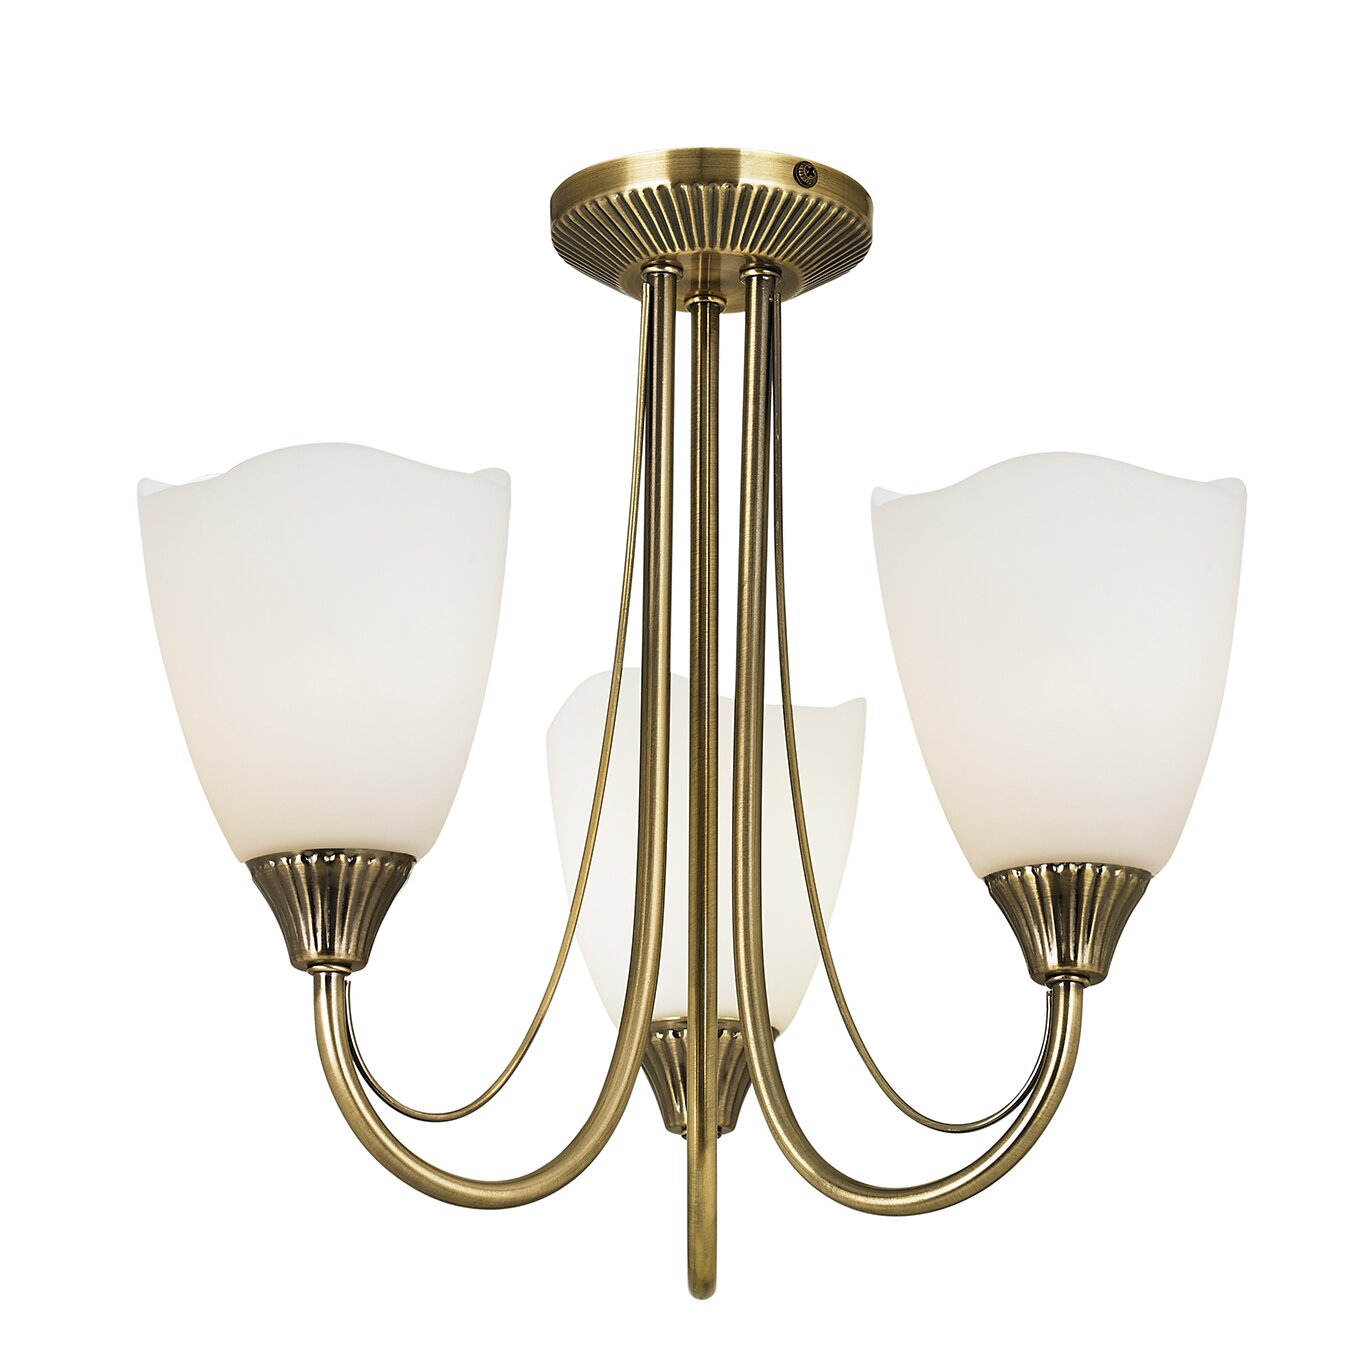 endon lighting deckenleuchte 3 flammig bewertungen. Black Bedroom Furniture Sets. Home Design Ideas